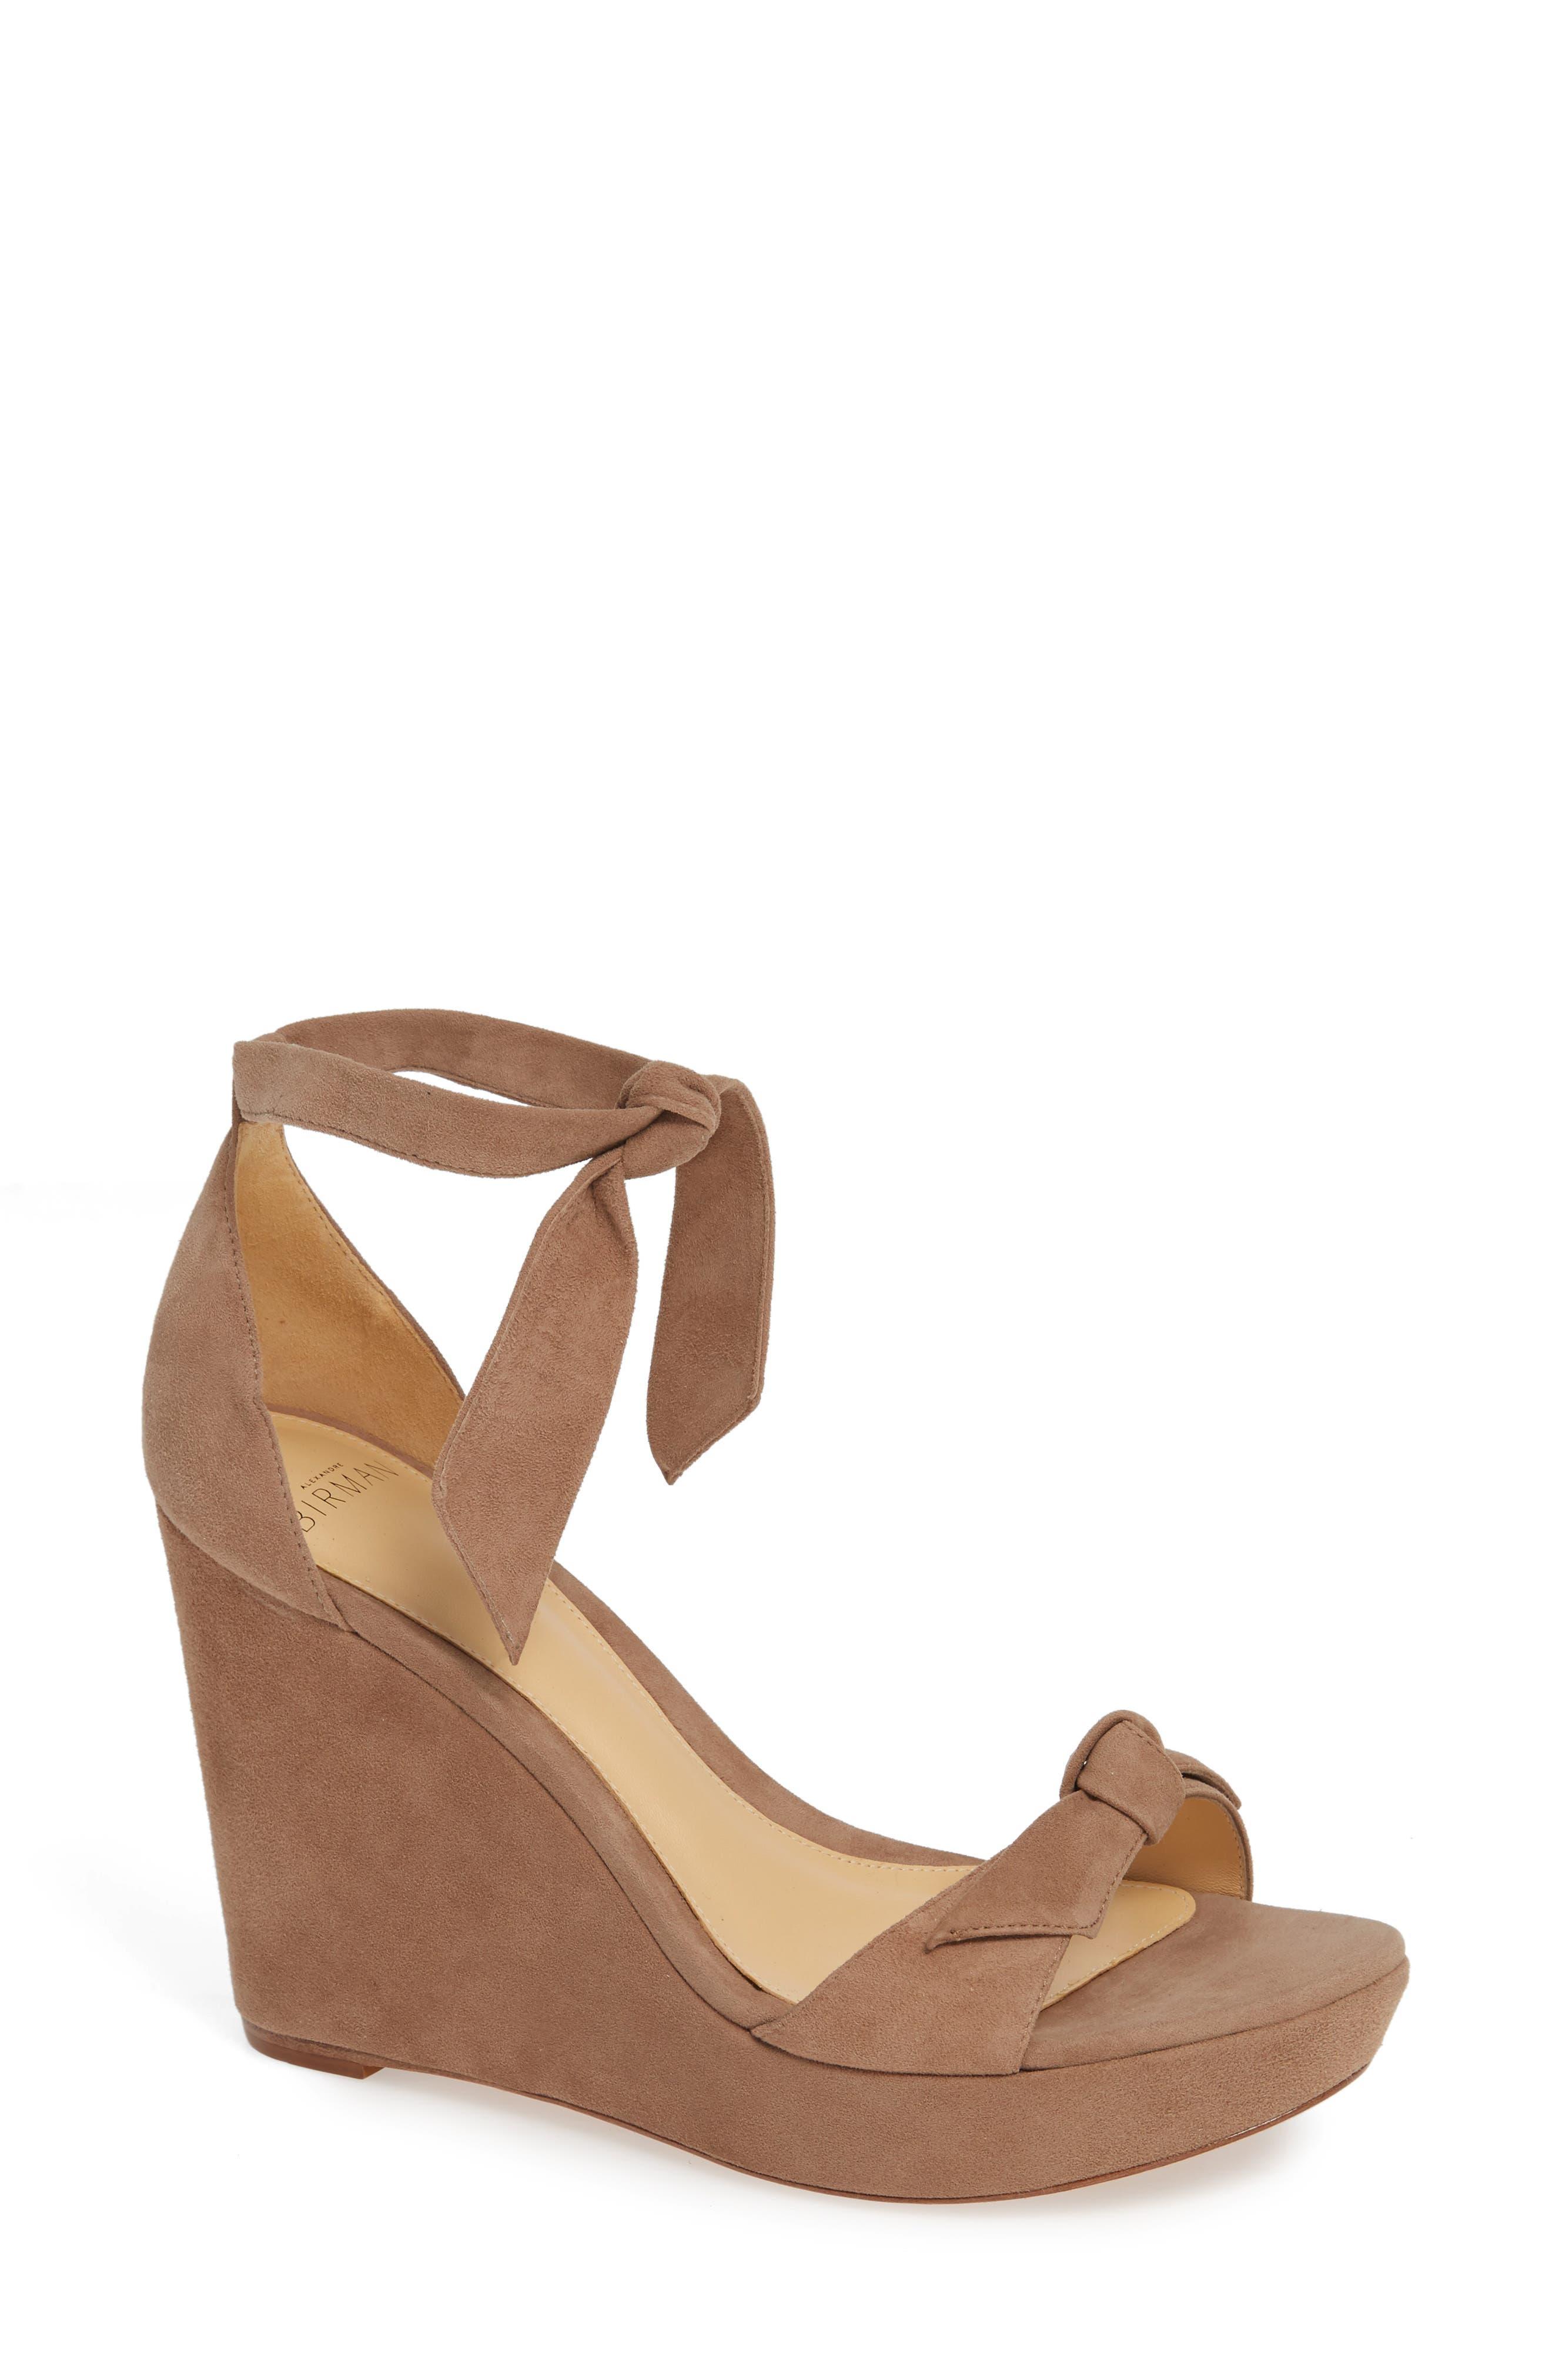 Clarita Platform Wedge Sandal,                             Main thumbnail 1, color,                             CAMEO SUEDE